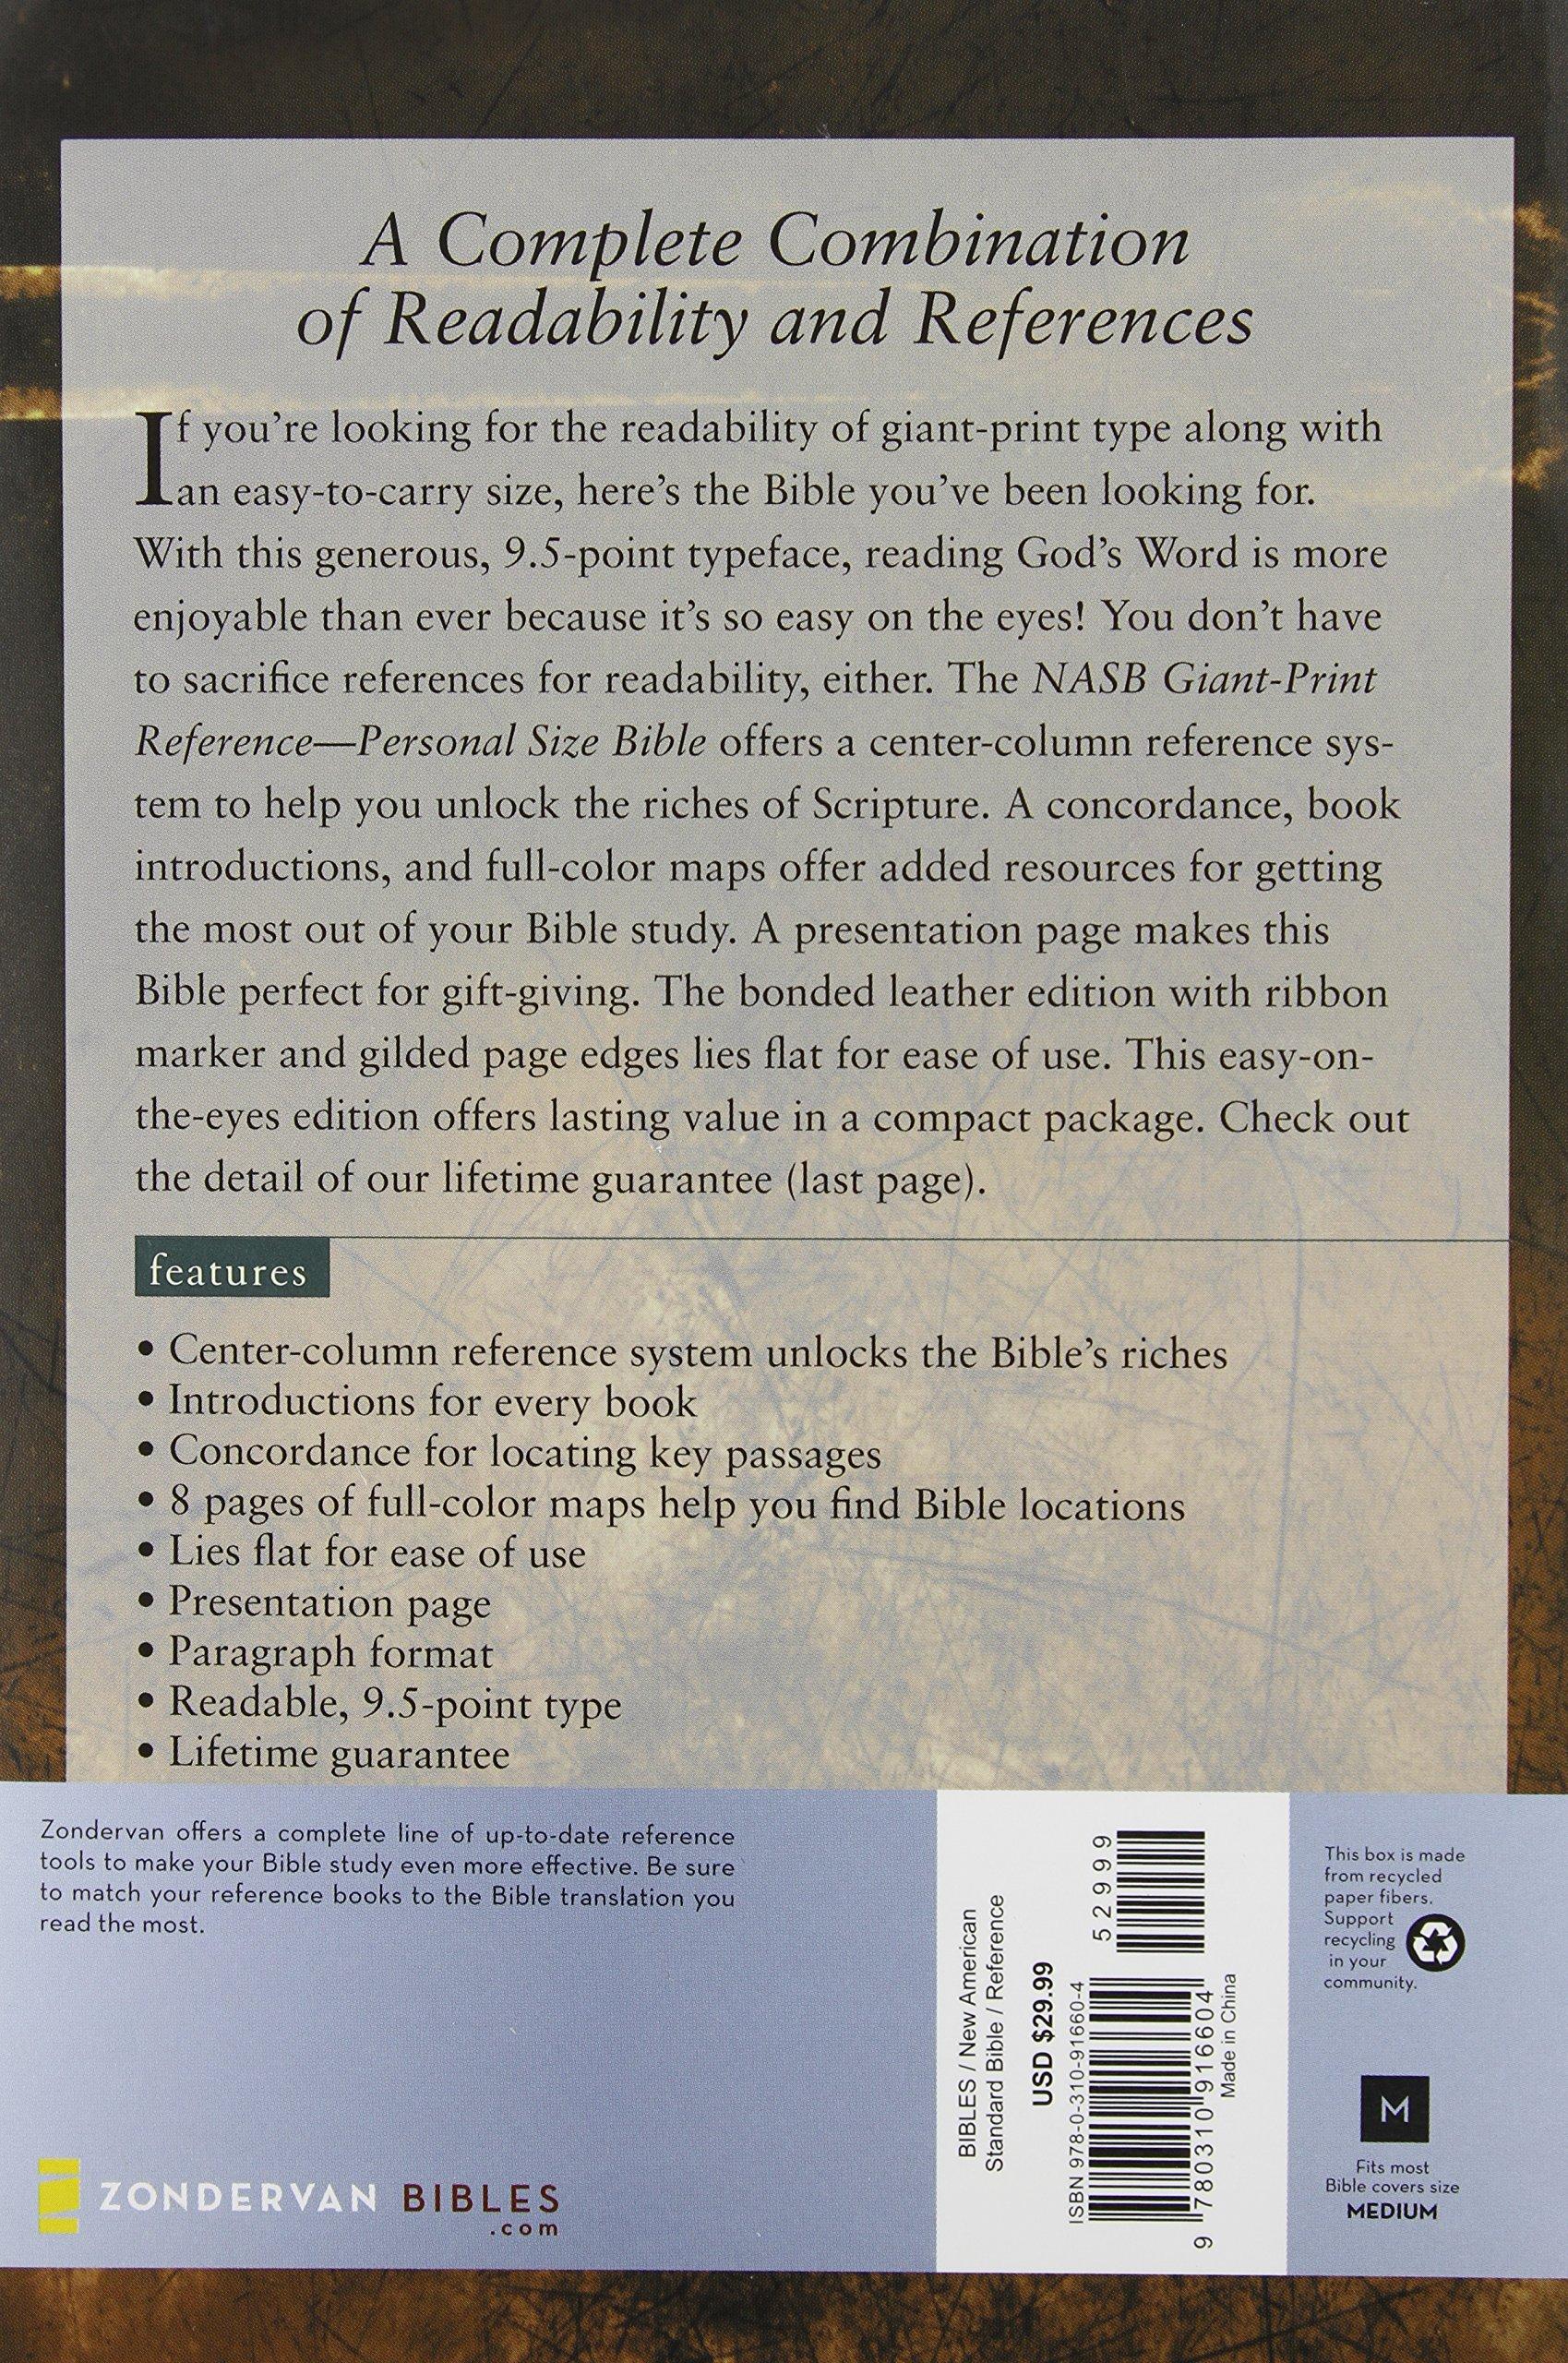 nasb giant print reference bible personal size zondervan